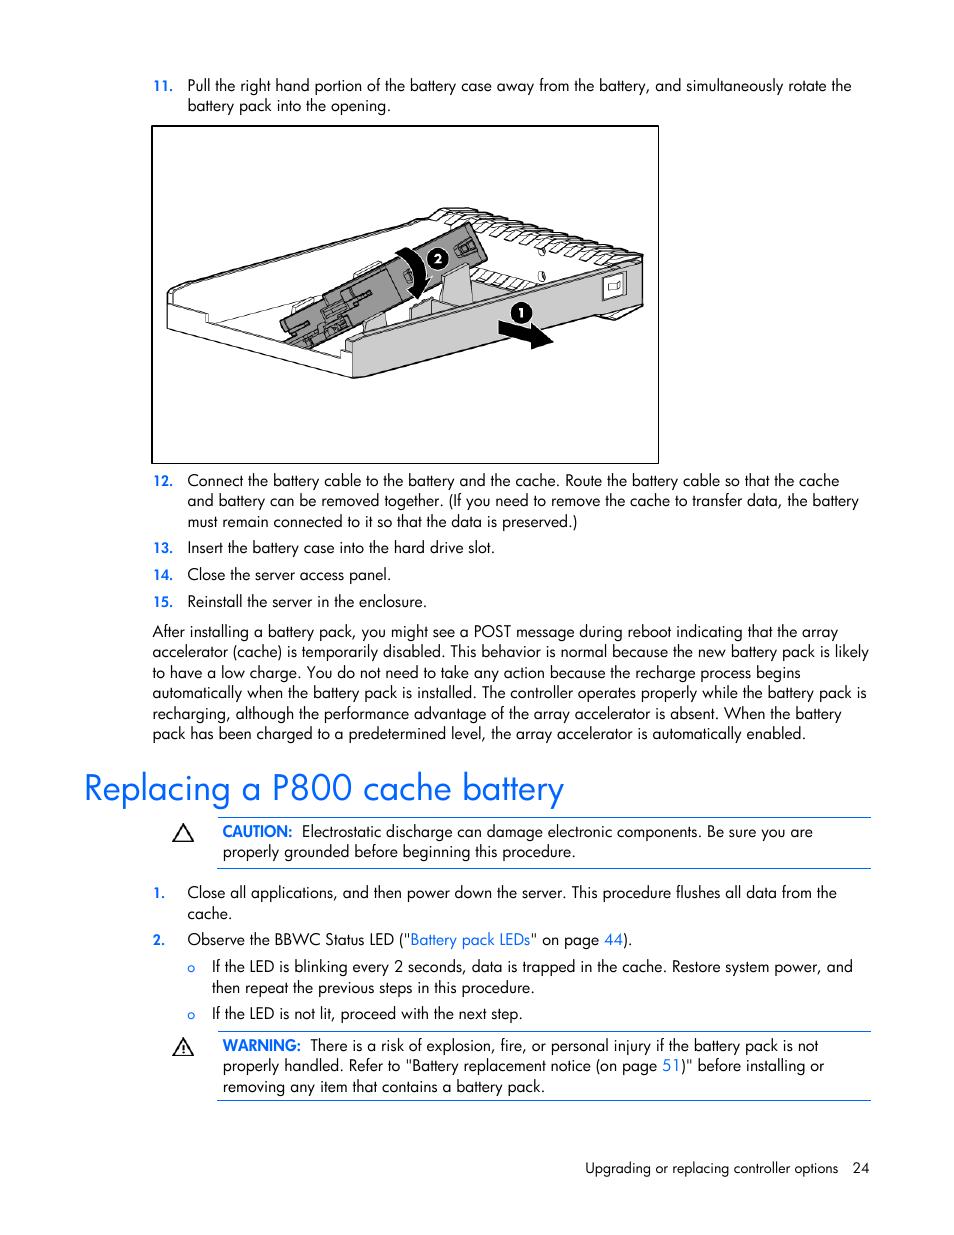 Replacing a p800 cache battery | hp smart array p800 controller.